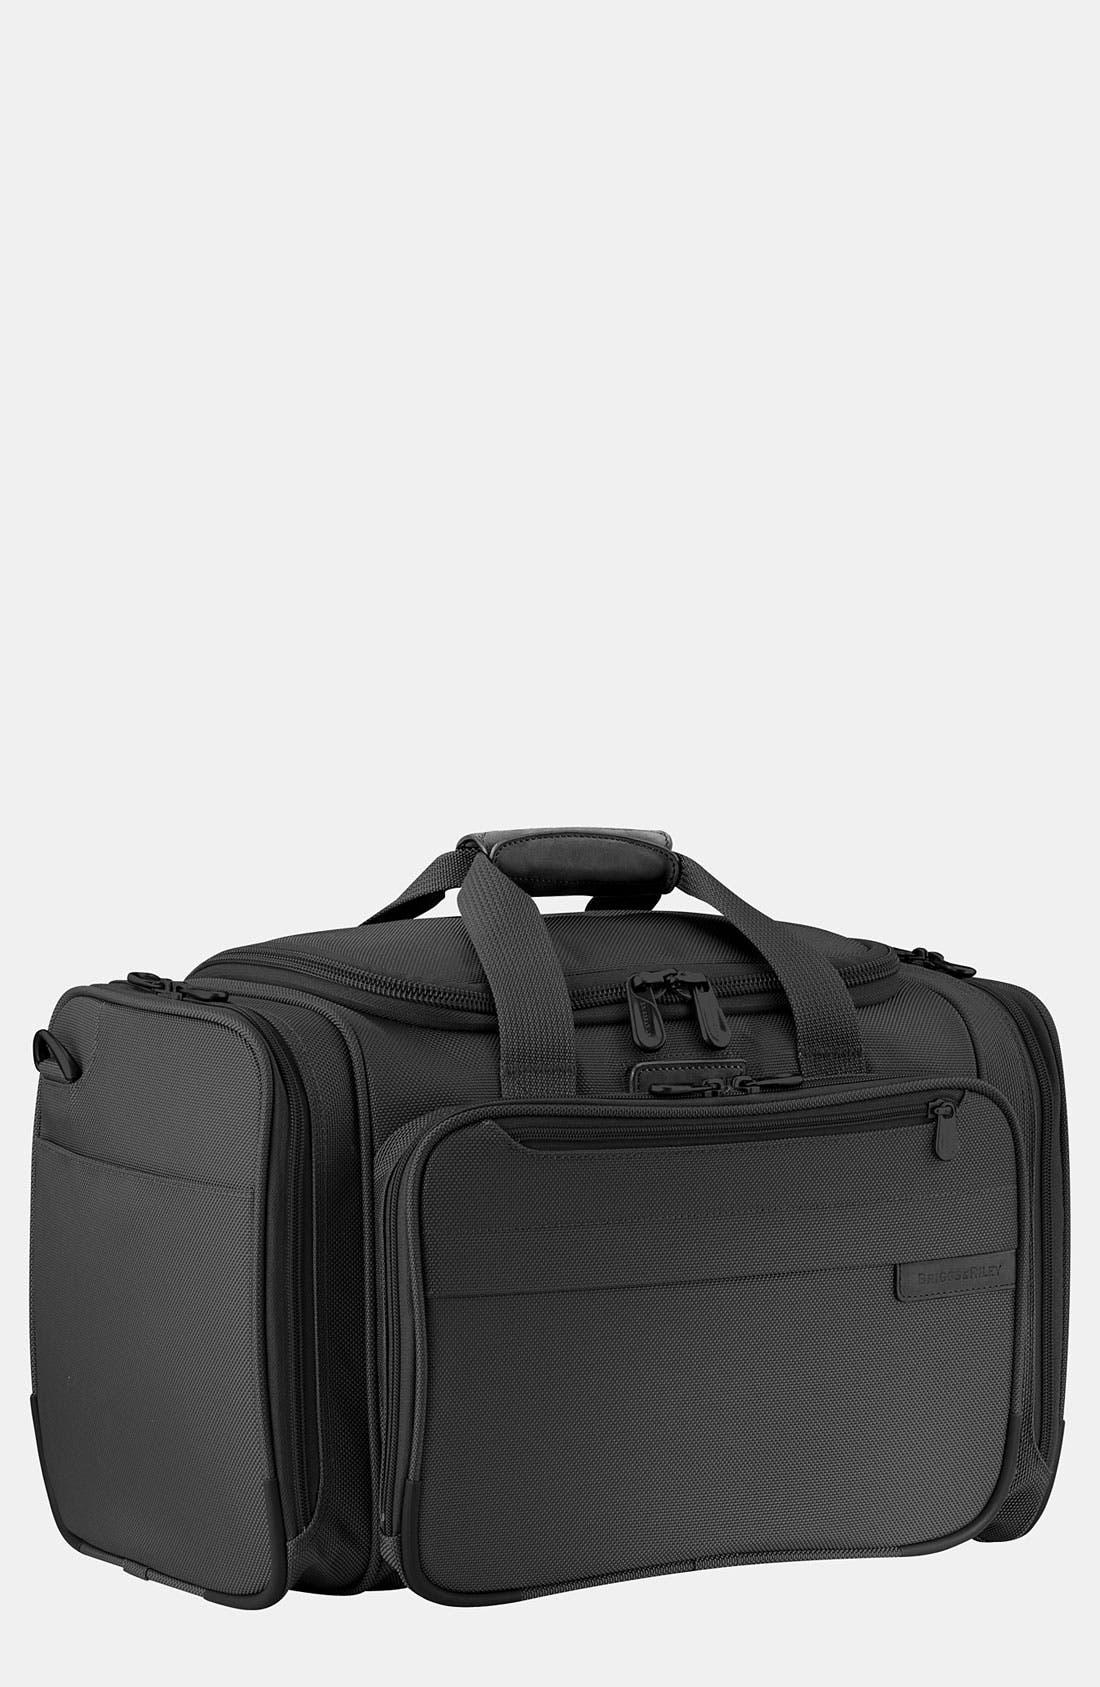 'Baseline - Deluxe' Duffel Bag,                             Main thumbnail 1, color,                             Black